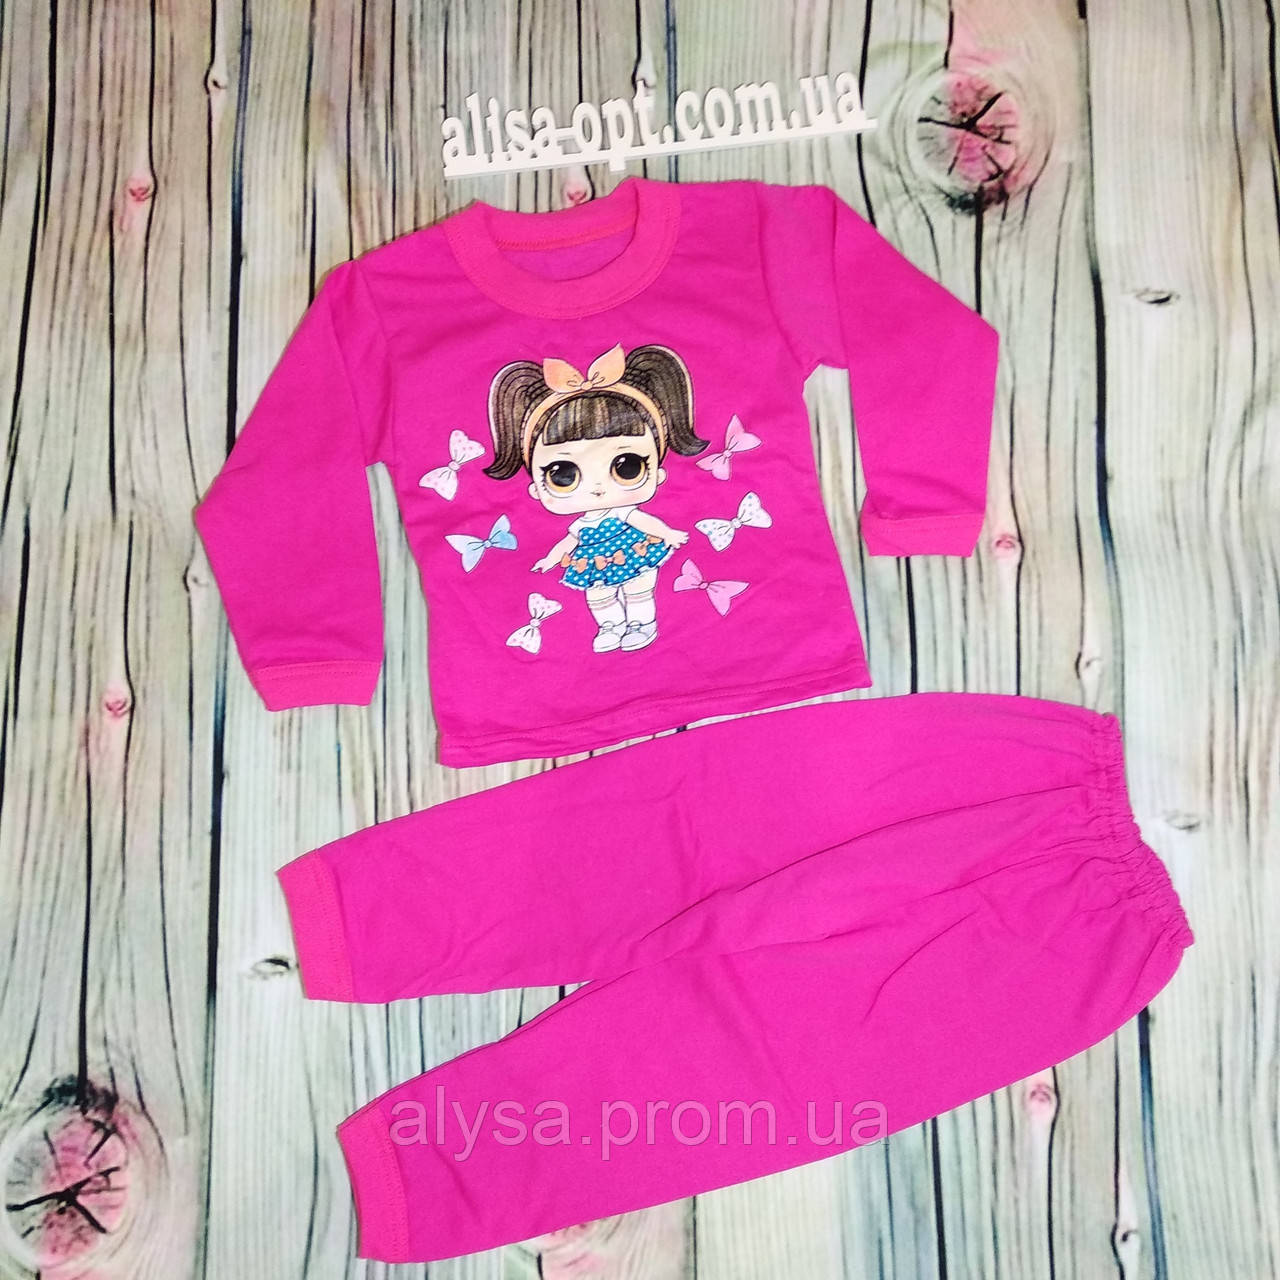 Детская пижама Лола начес